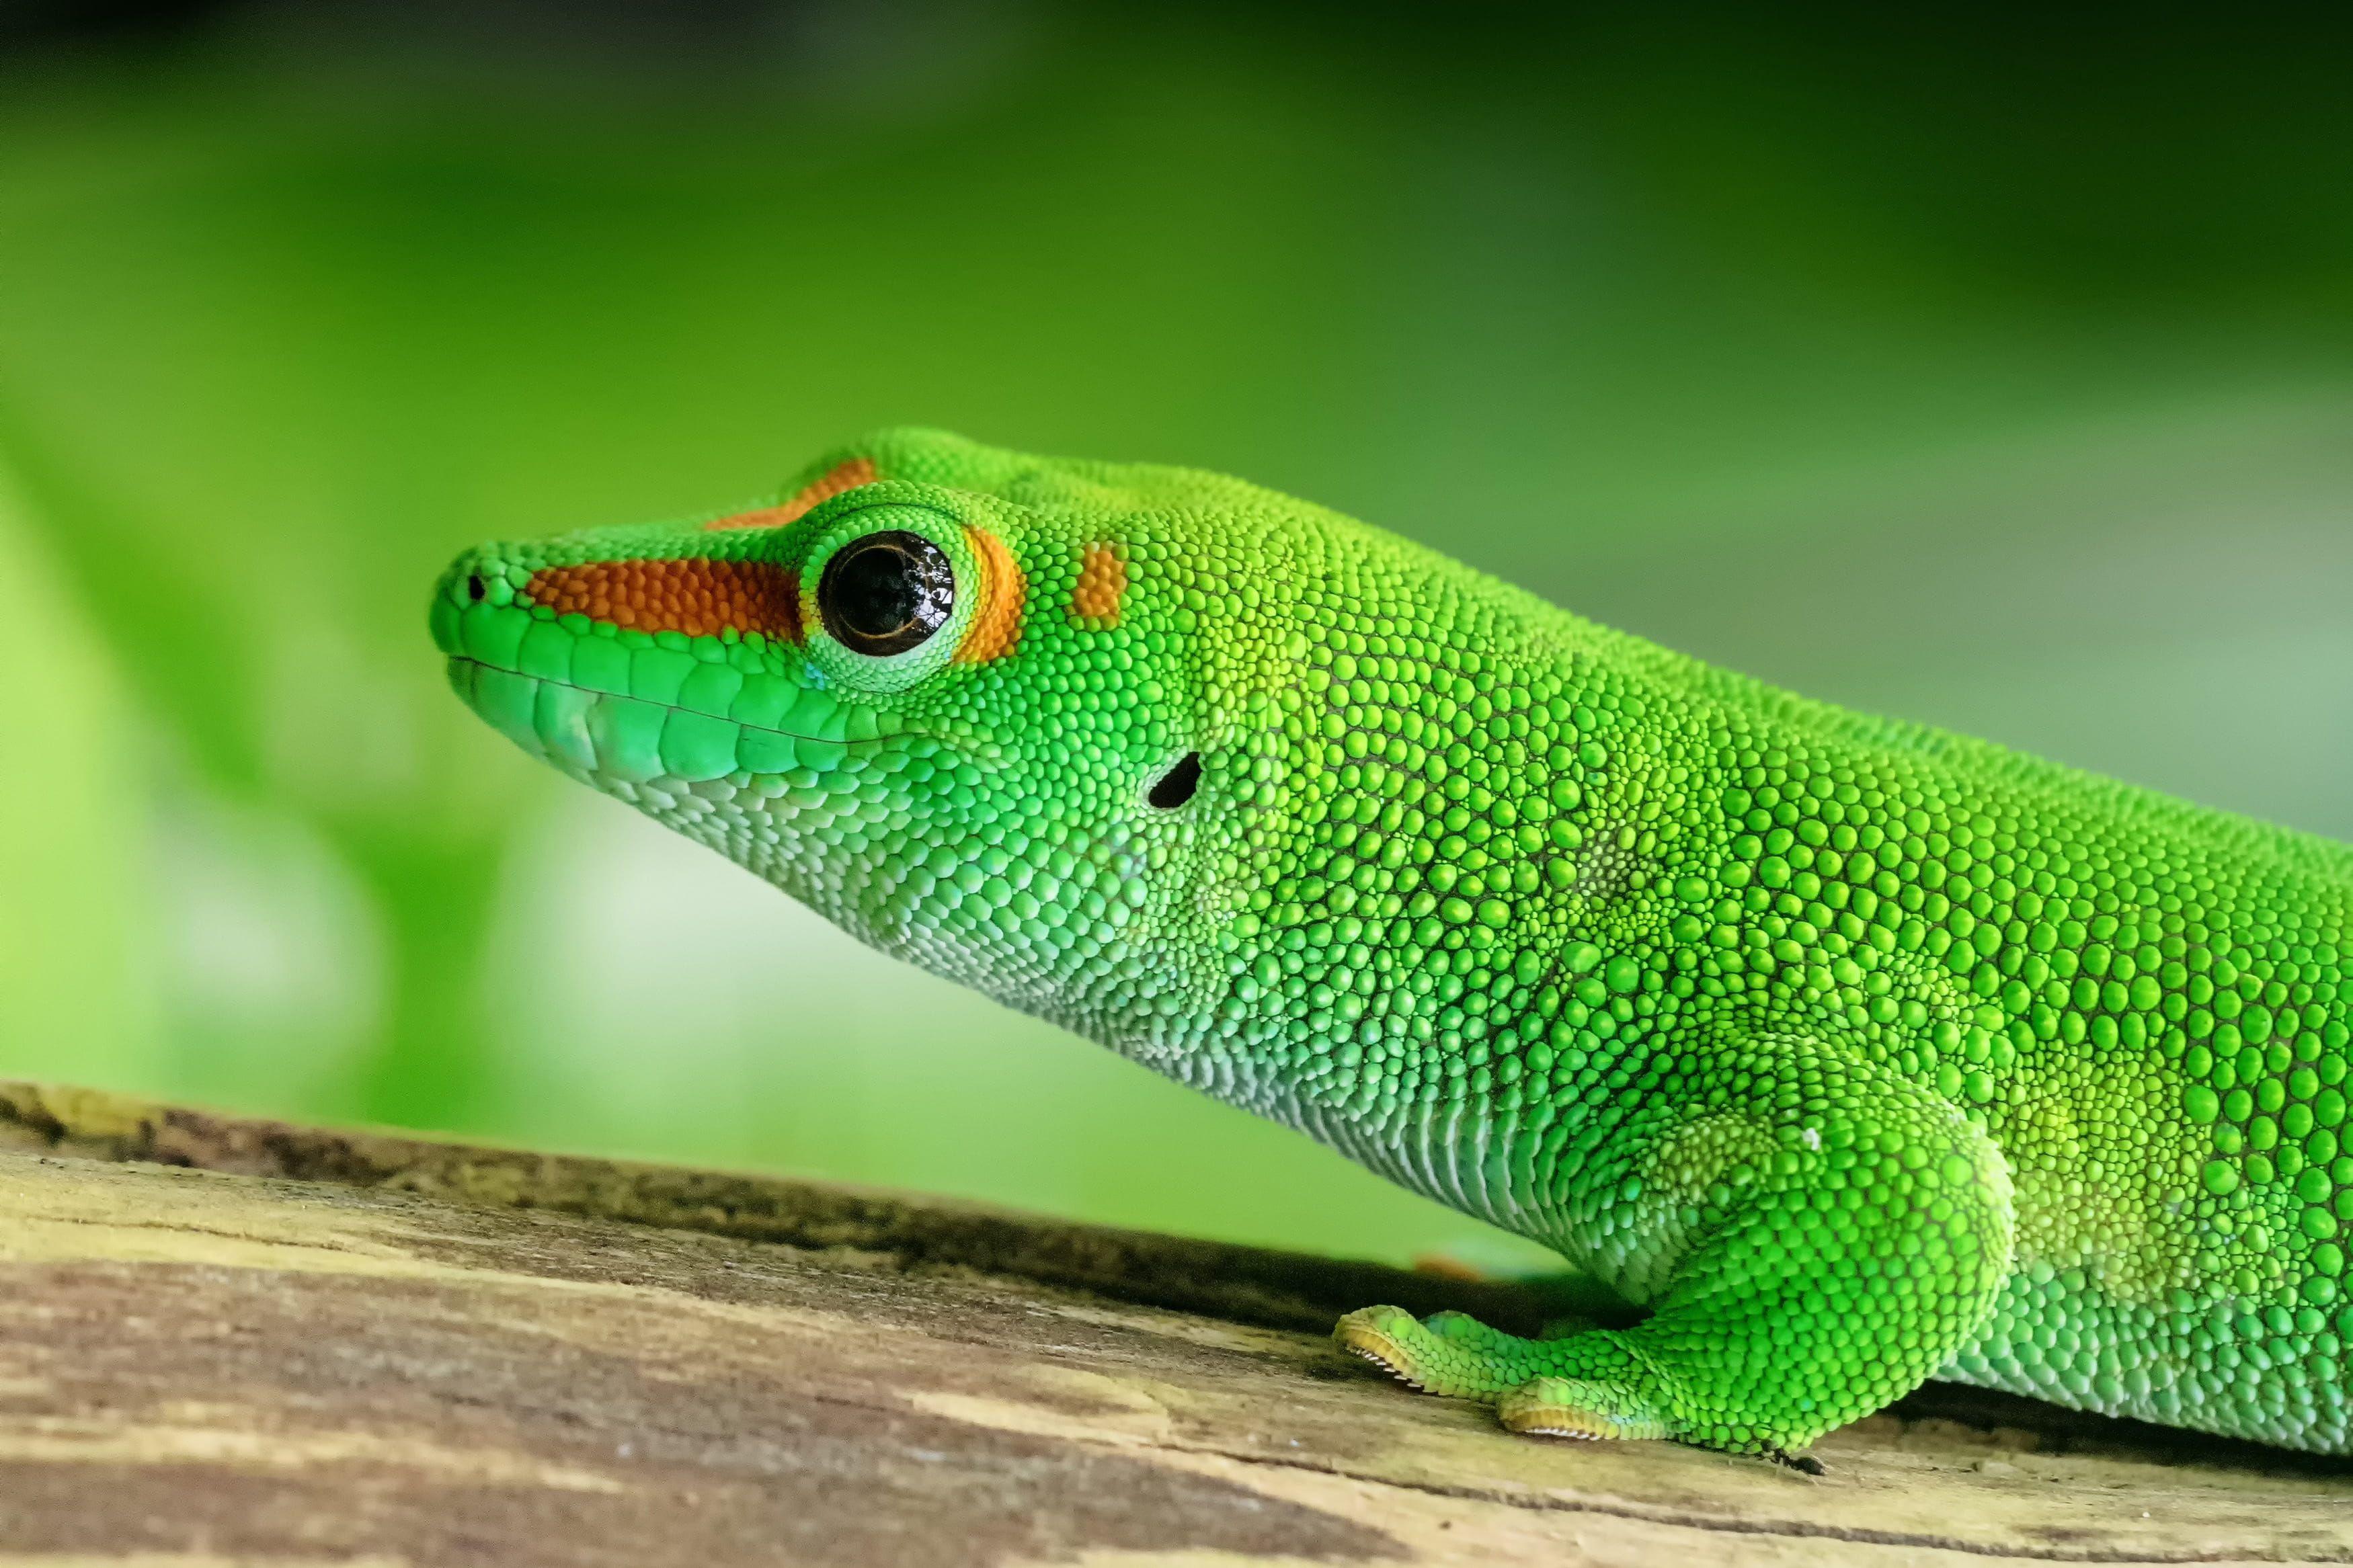 Gecko Lizard Animals Green Color Animal Themes Animal One Animal Vertebrate Animal Wildlife Reptile Animals In The Wild Close U Gecko Lizard Spirit Animal